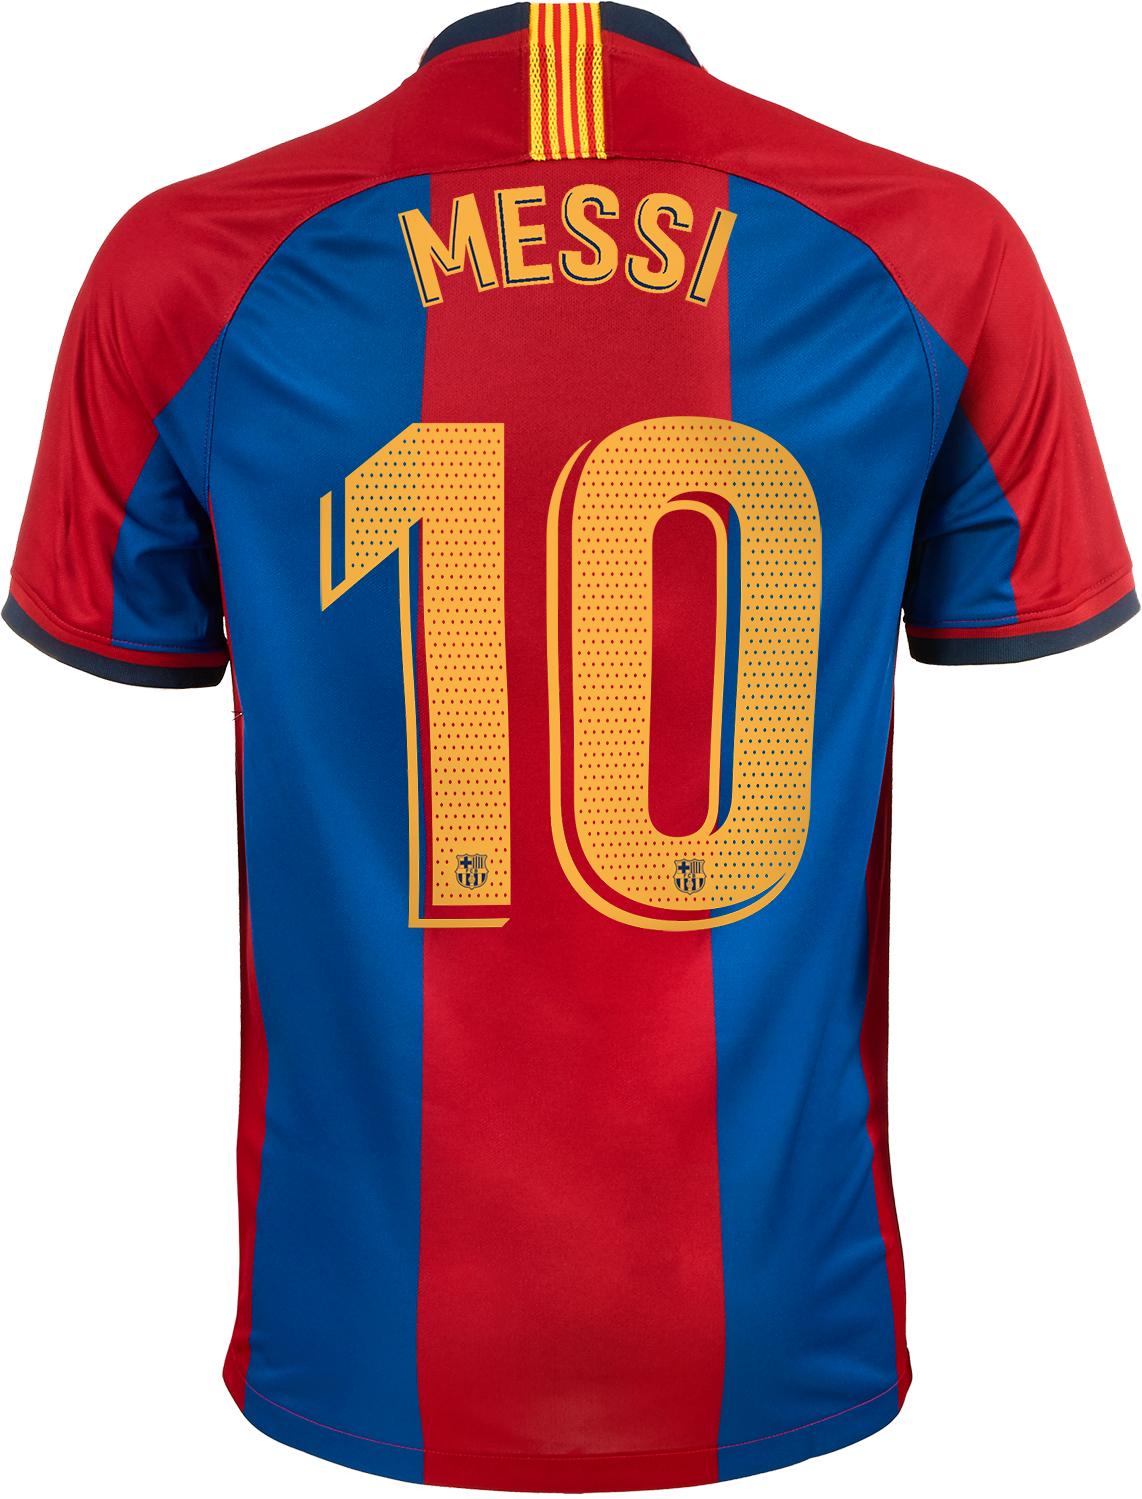 wholesale dealer 23437 b2905 Nike Lionel Messi 98/99 Barcelona Home Jersey - SoccerPro